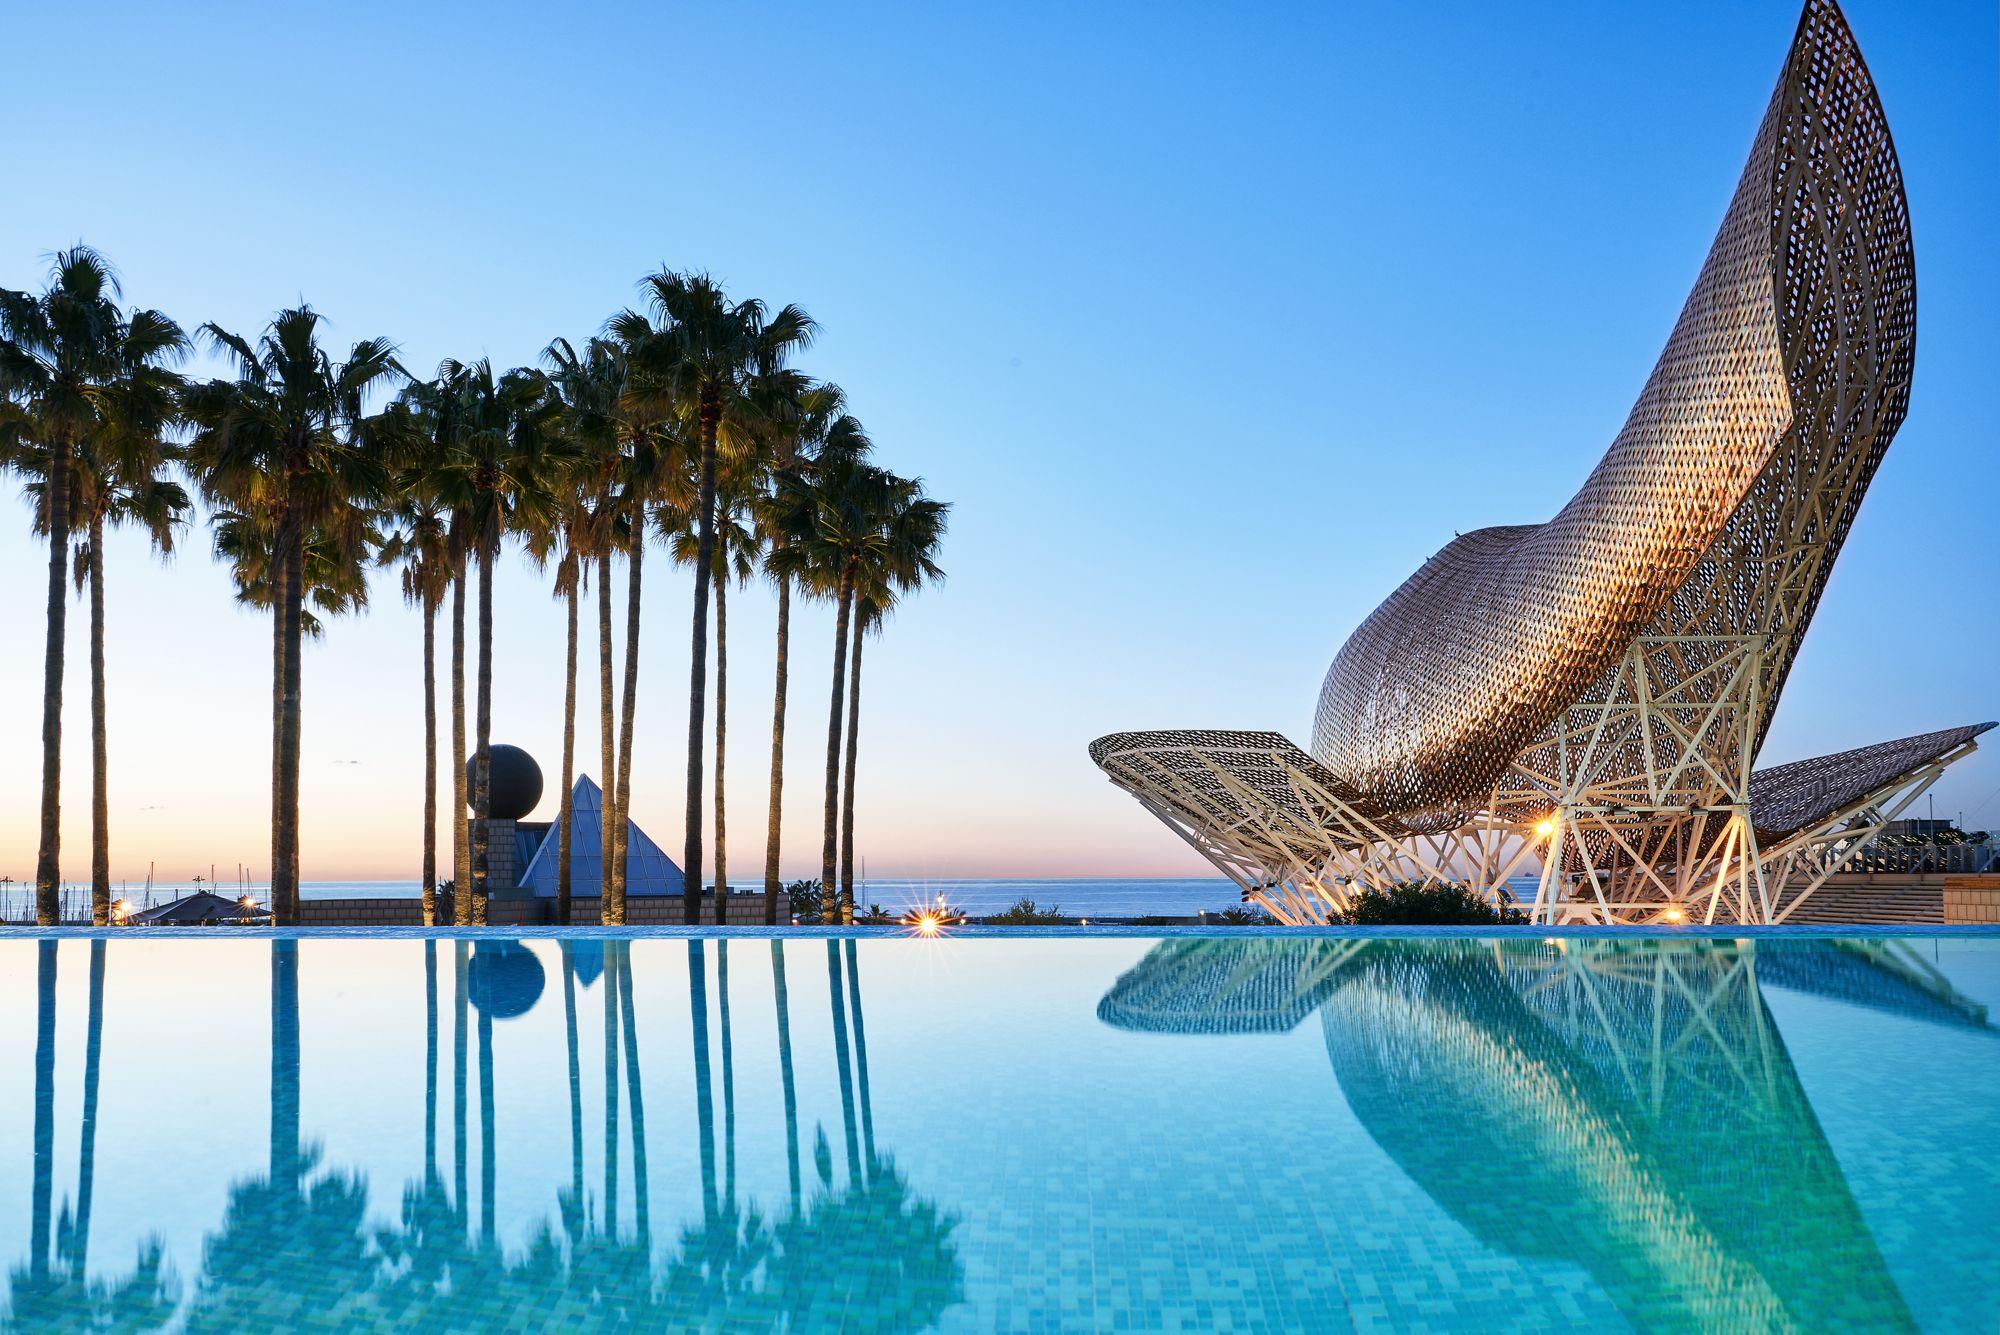 Infinity Pool at Hotel Arts Barcelona